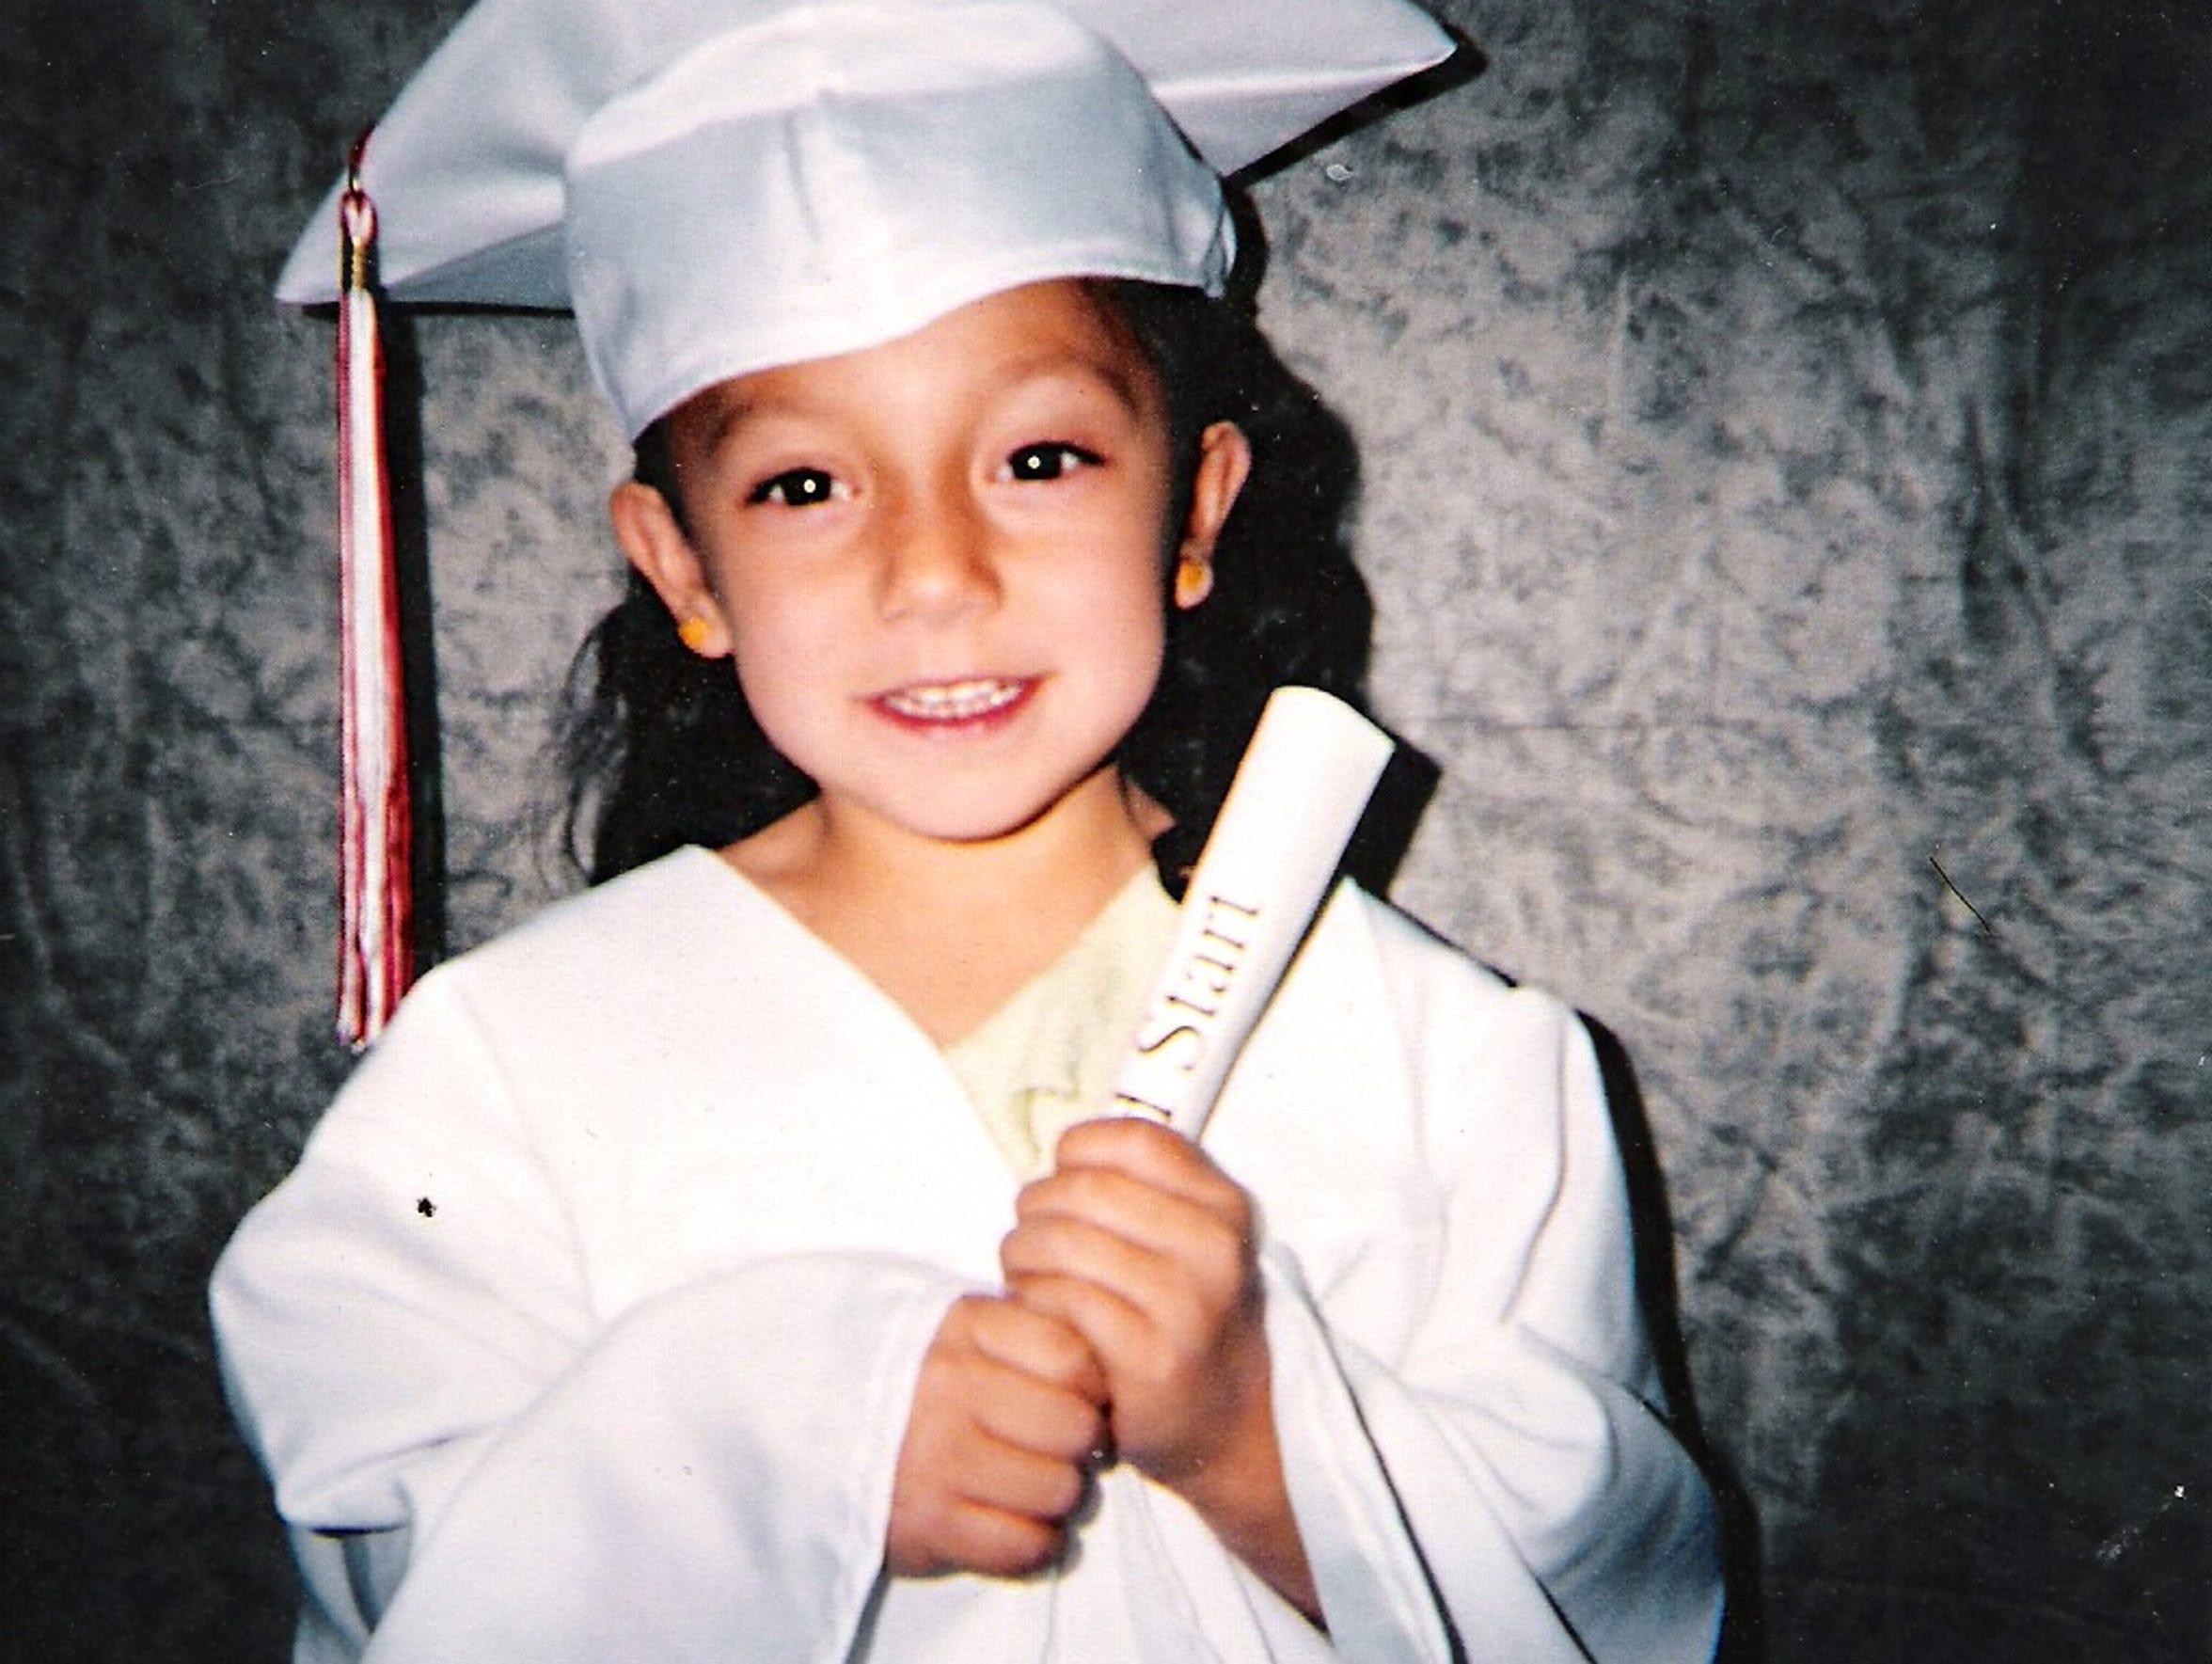 Jocelyn Najera's first graduation as a child